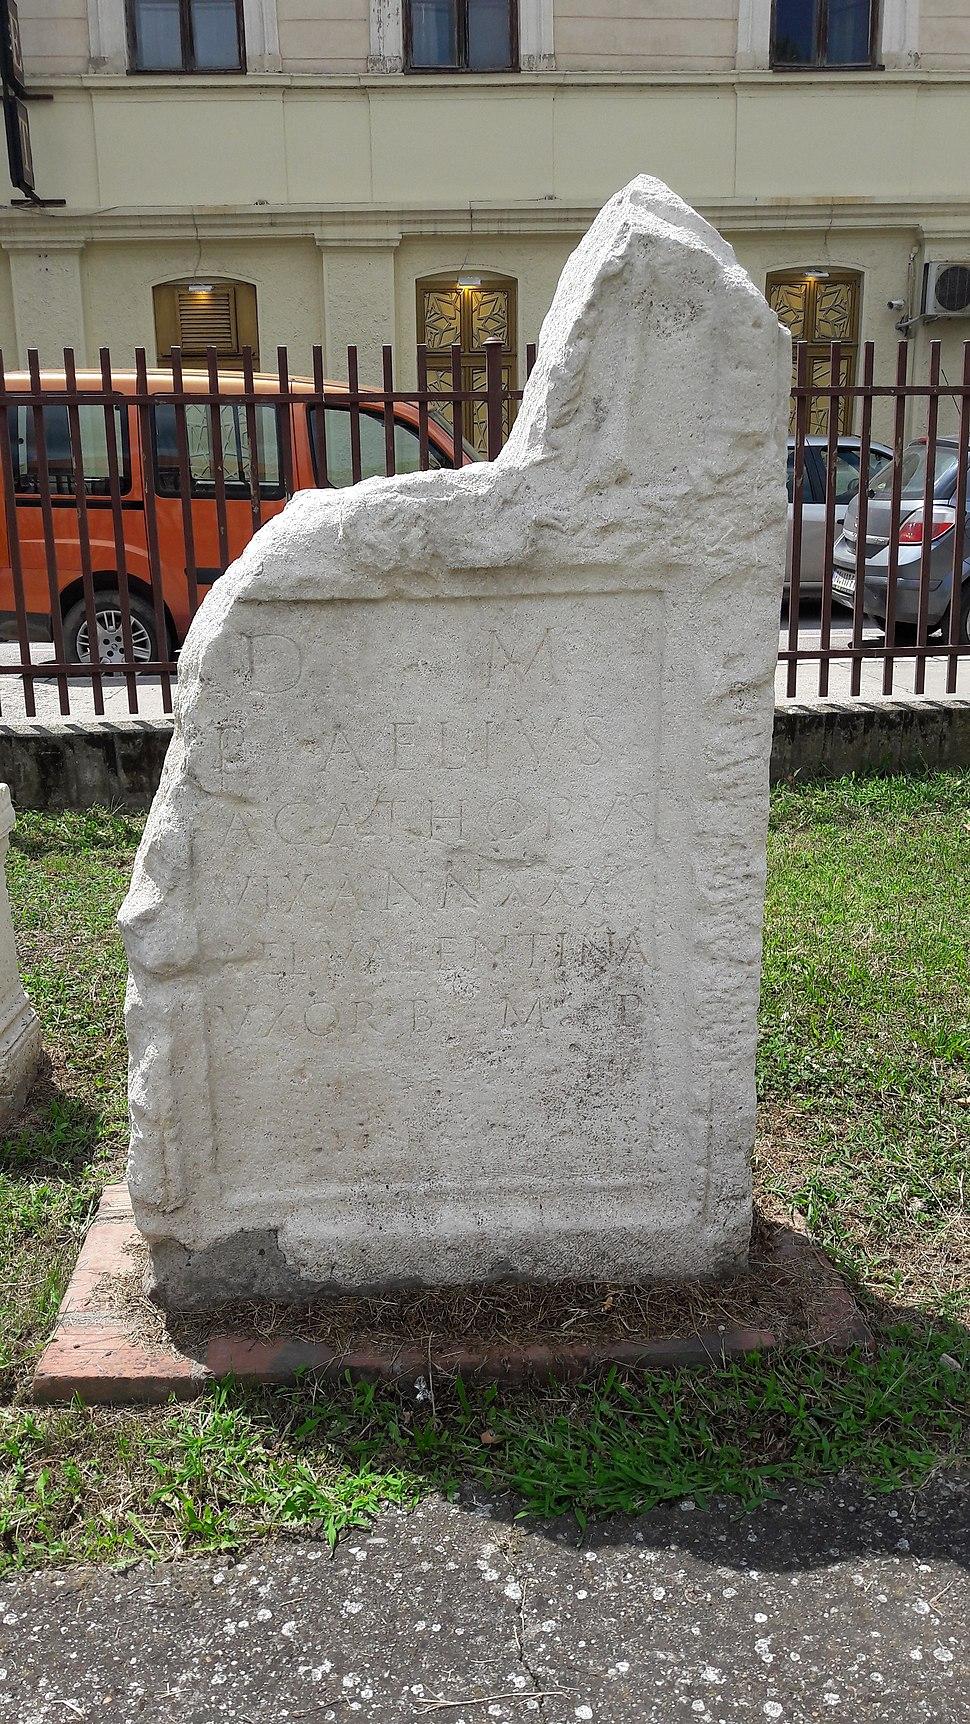 National museum in Požarevac, a stele